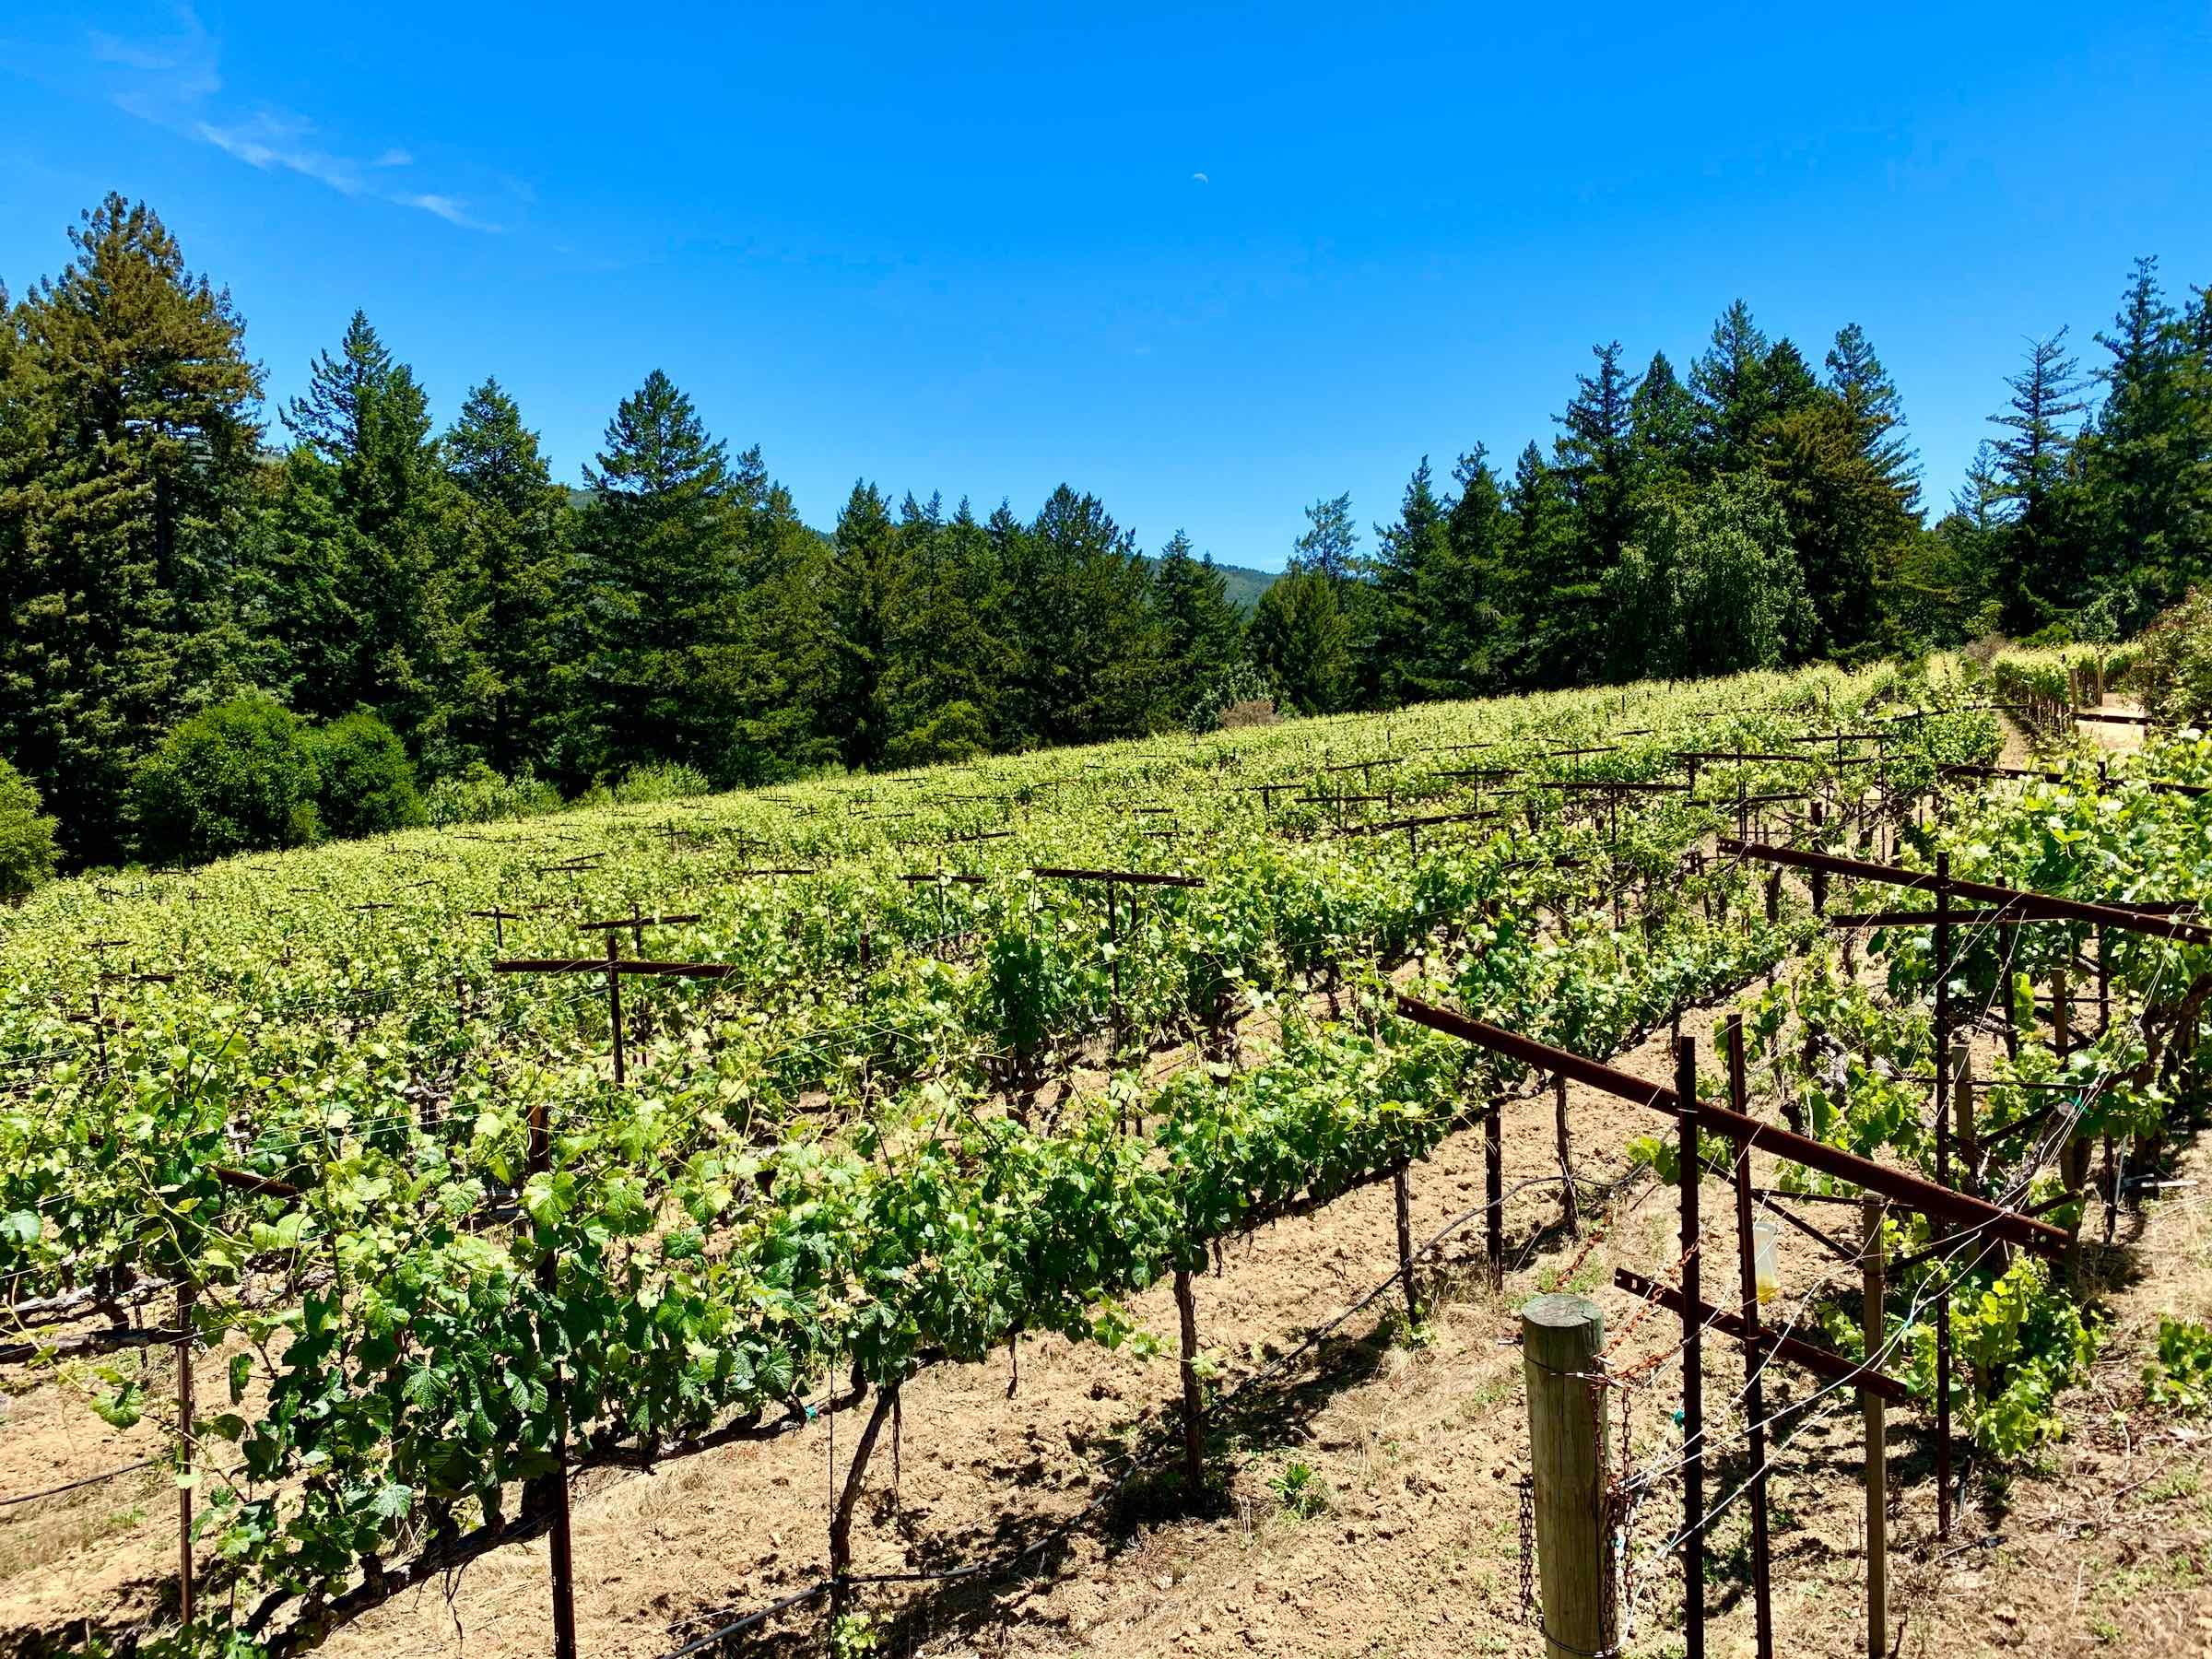 Santa Cruz Mountains American Viticultural Area Grape Vines